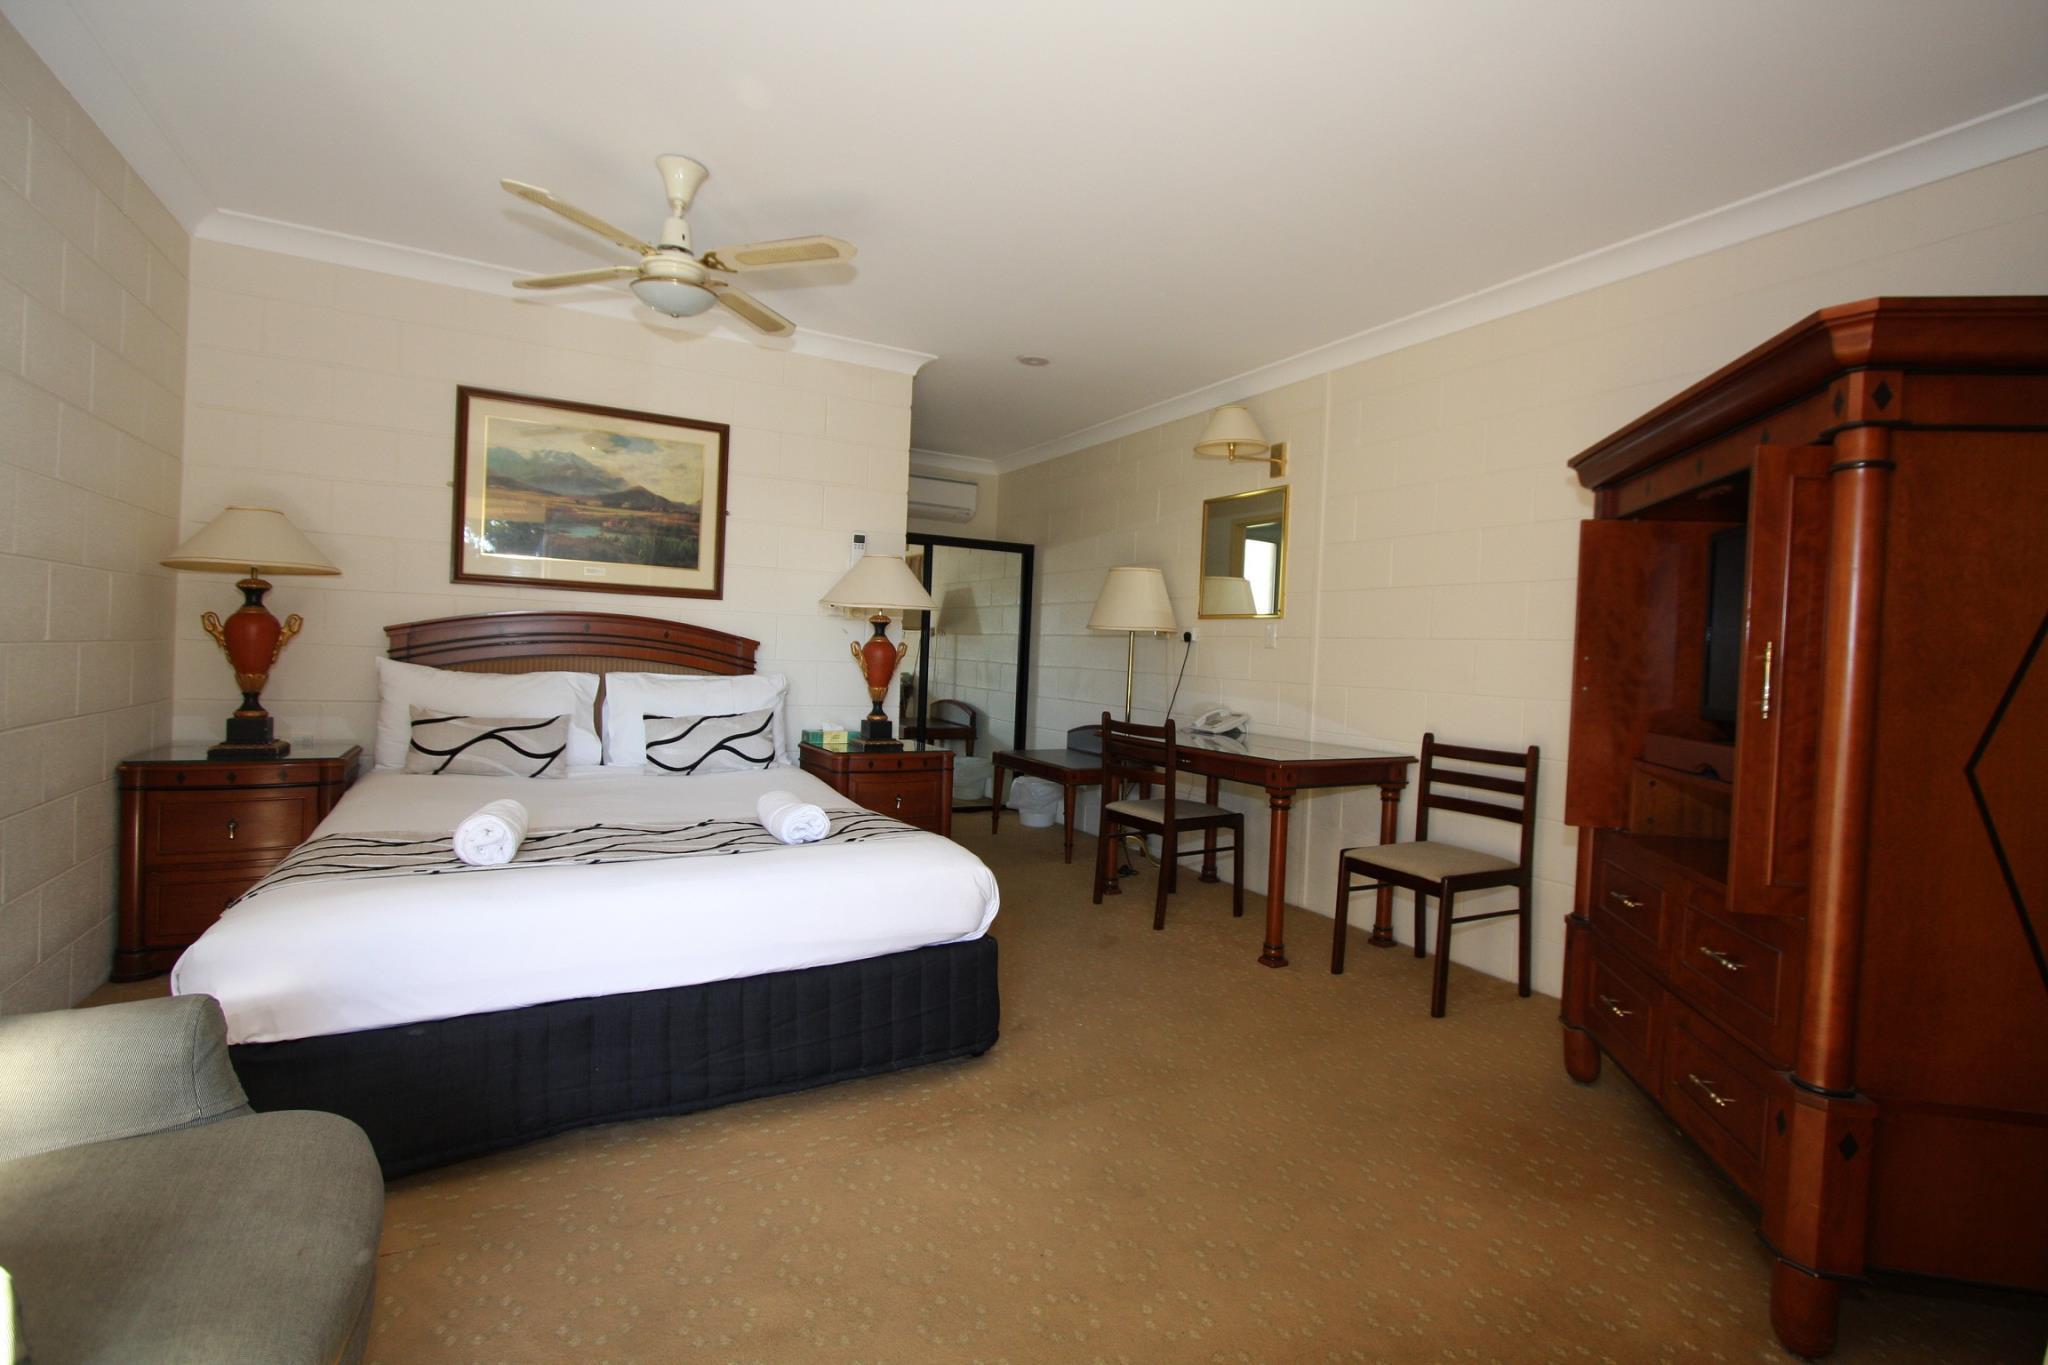 Picton Valley Motel